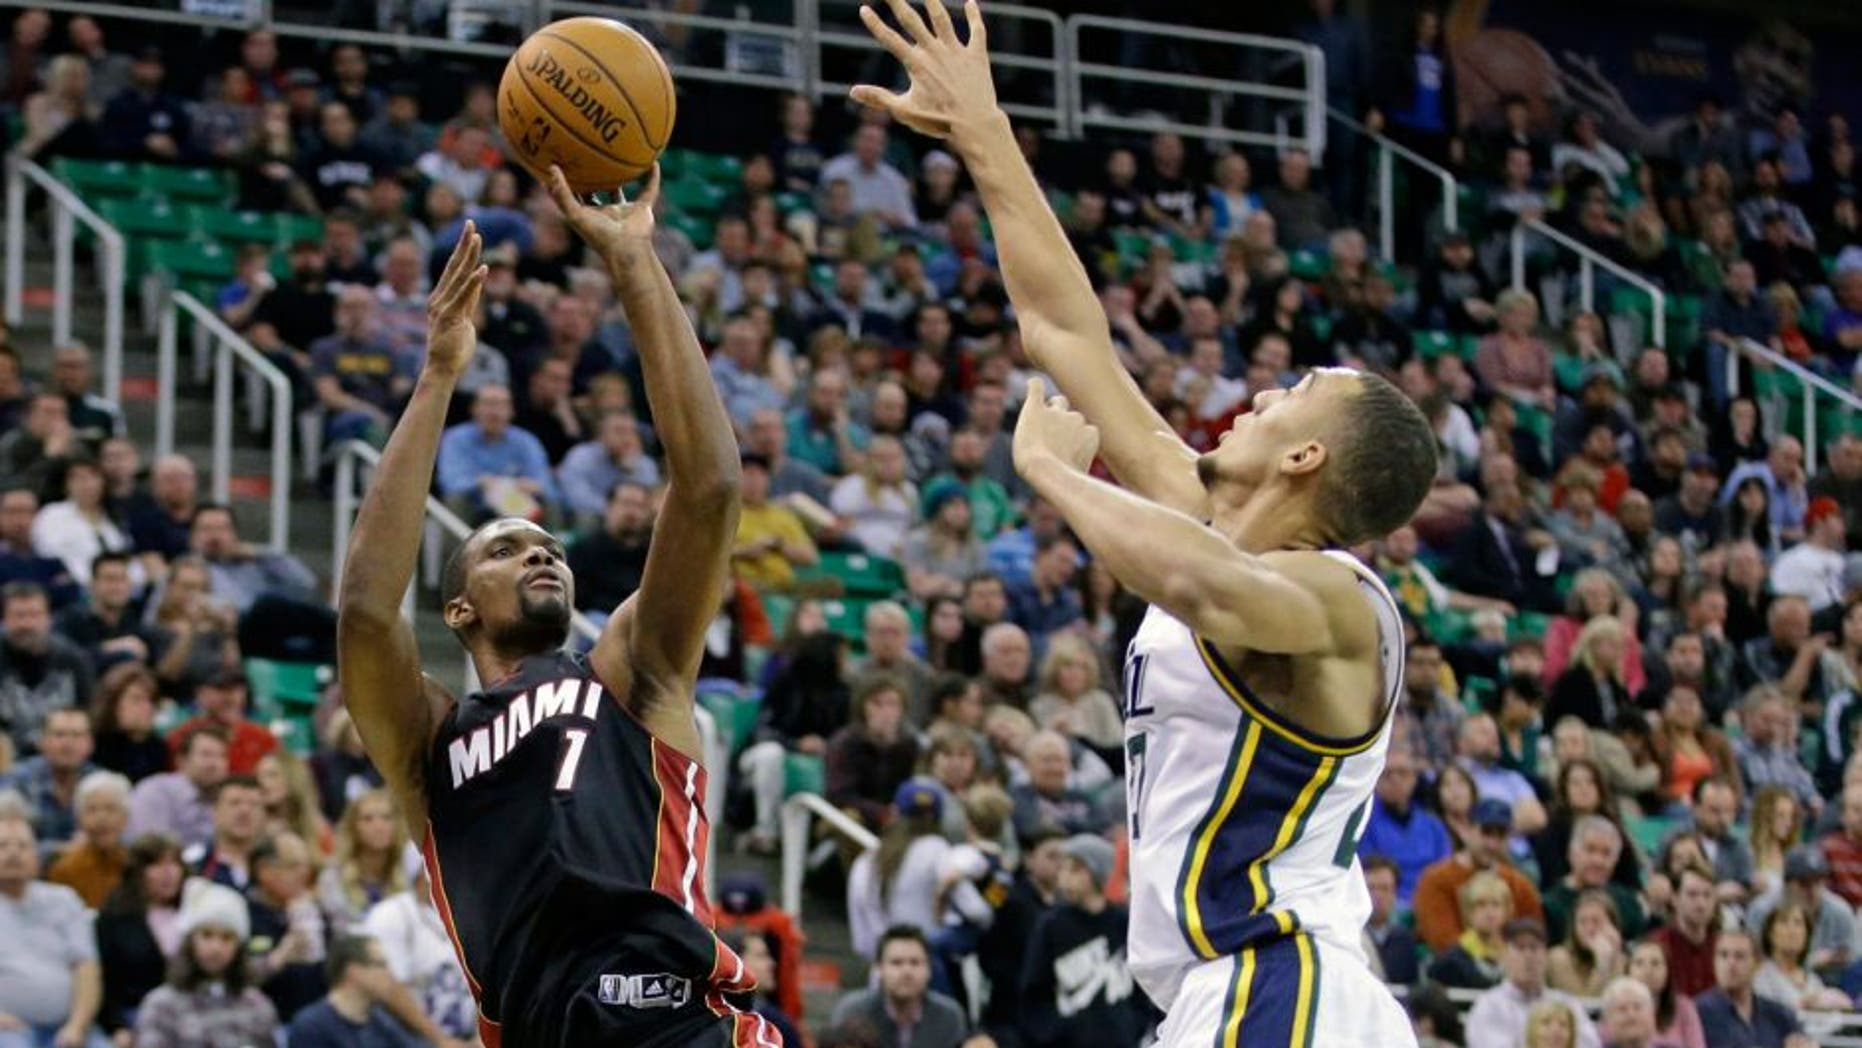 Miami Heat center Chris Bosh (1) shoots as Utah Jazz center Rudy Gobert, right, defends in the second quarter during an NBA basketball game Friday, Dec. 12, 2014, in Salt Lake City. (AP Photo/Rick Bowmer)